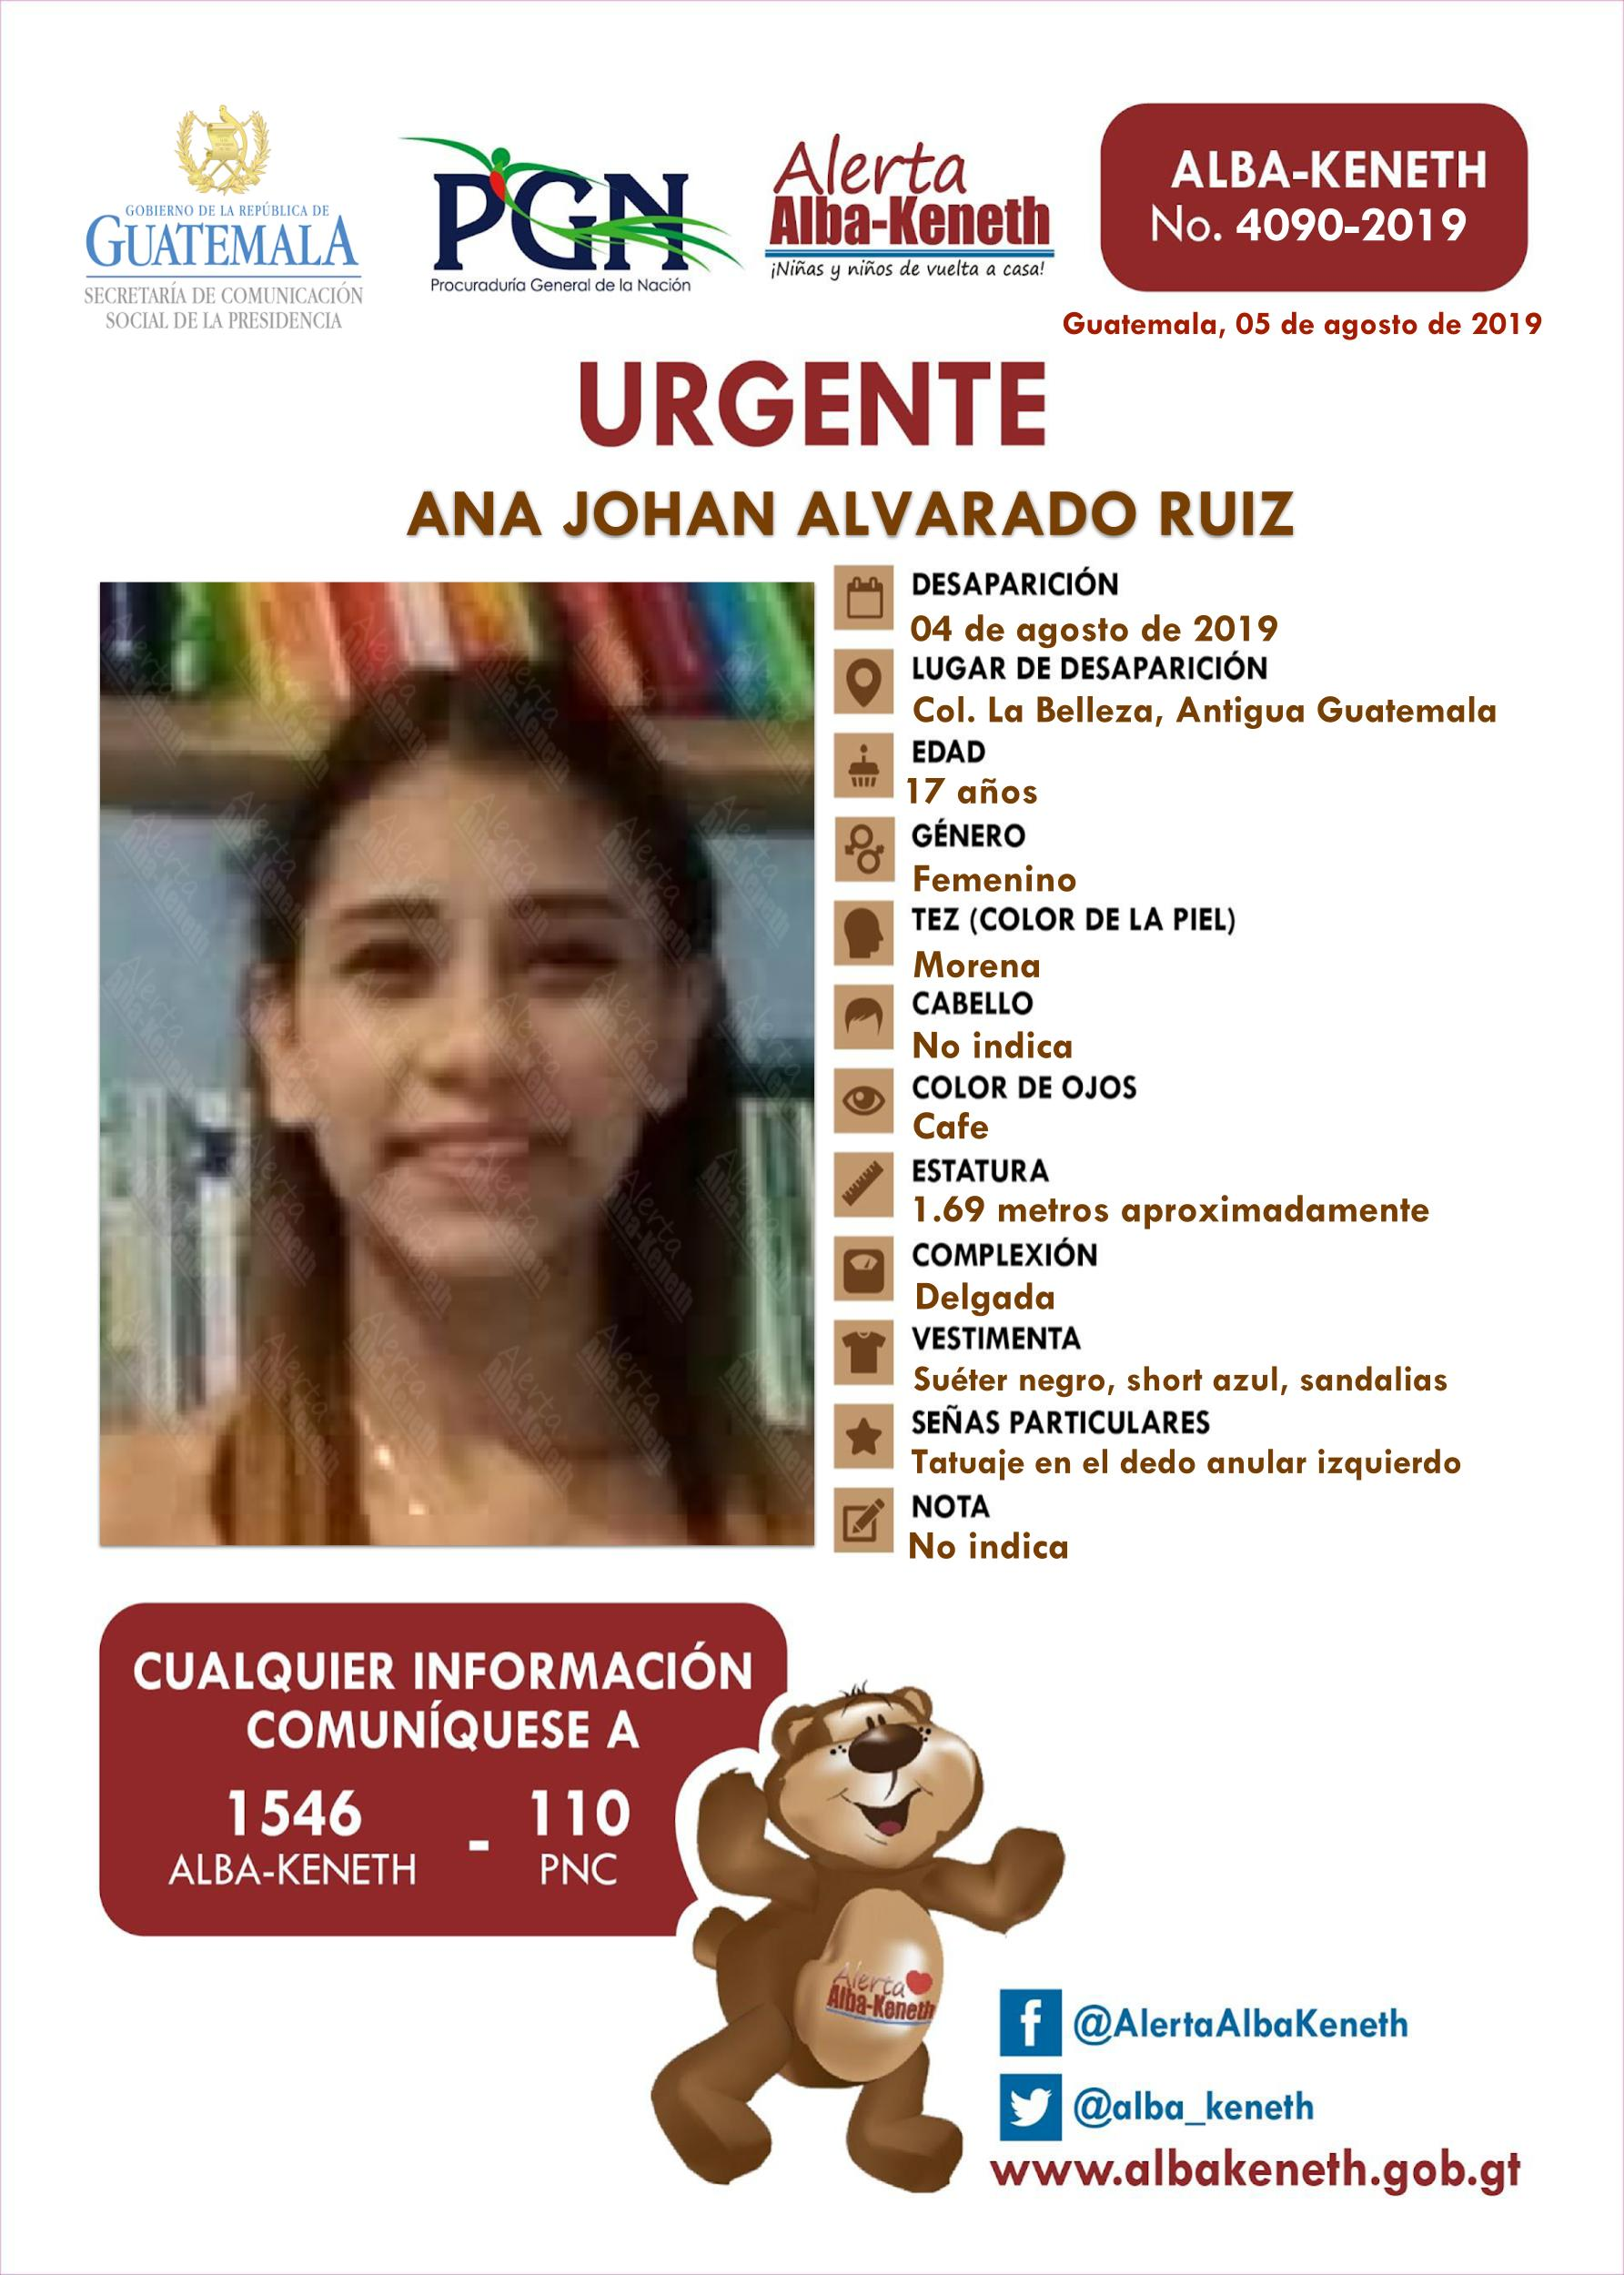 Ana Johan Alvarado Ruiz